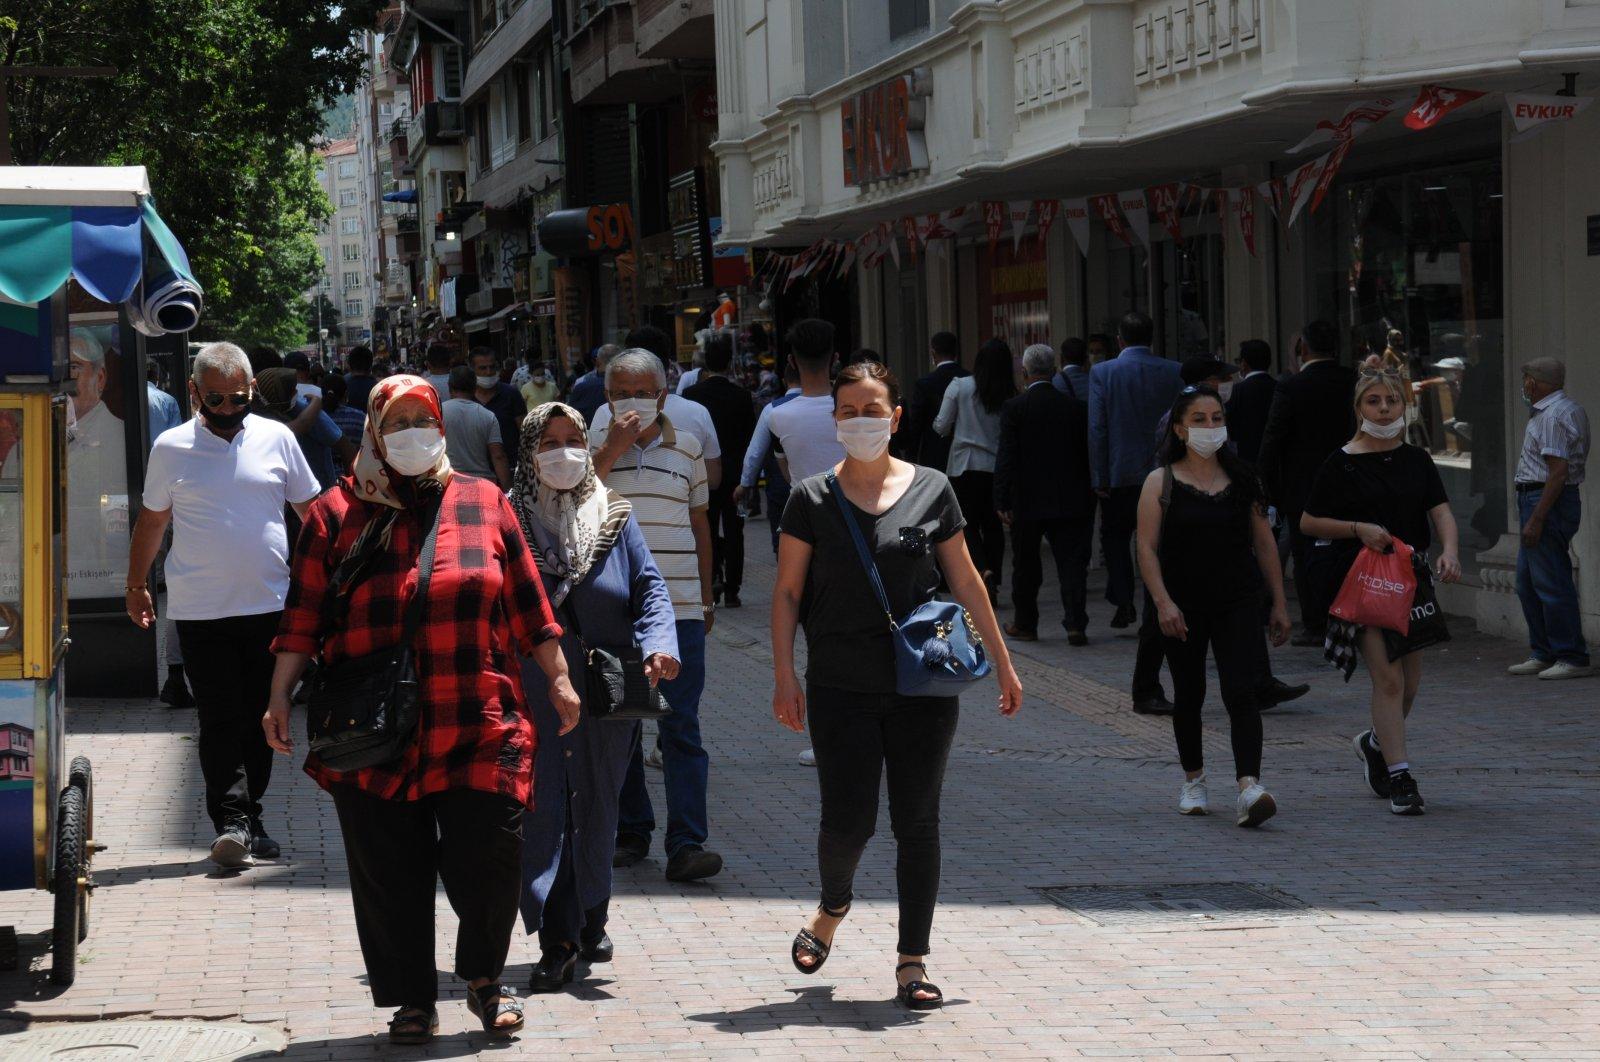 People wearing masks against the coronavirus walk on the street, in Eskişehir, Turkey, July 14, 2020. (IHA Photo)